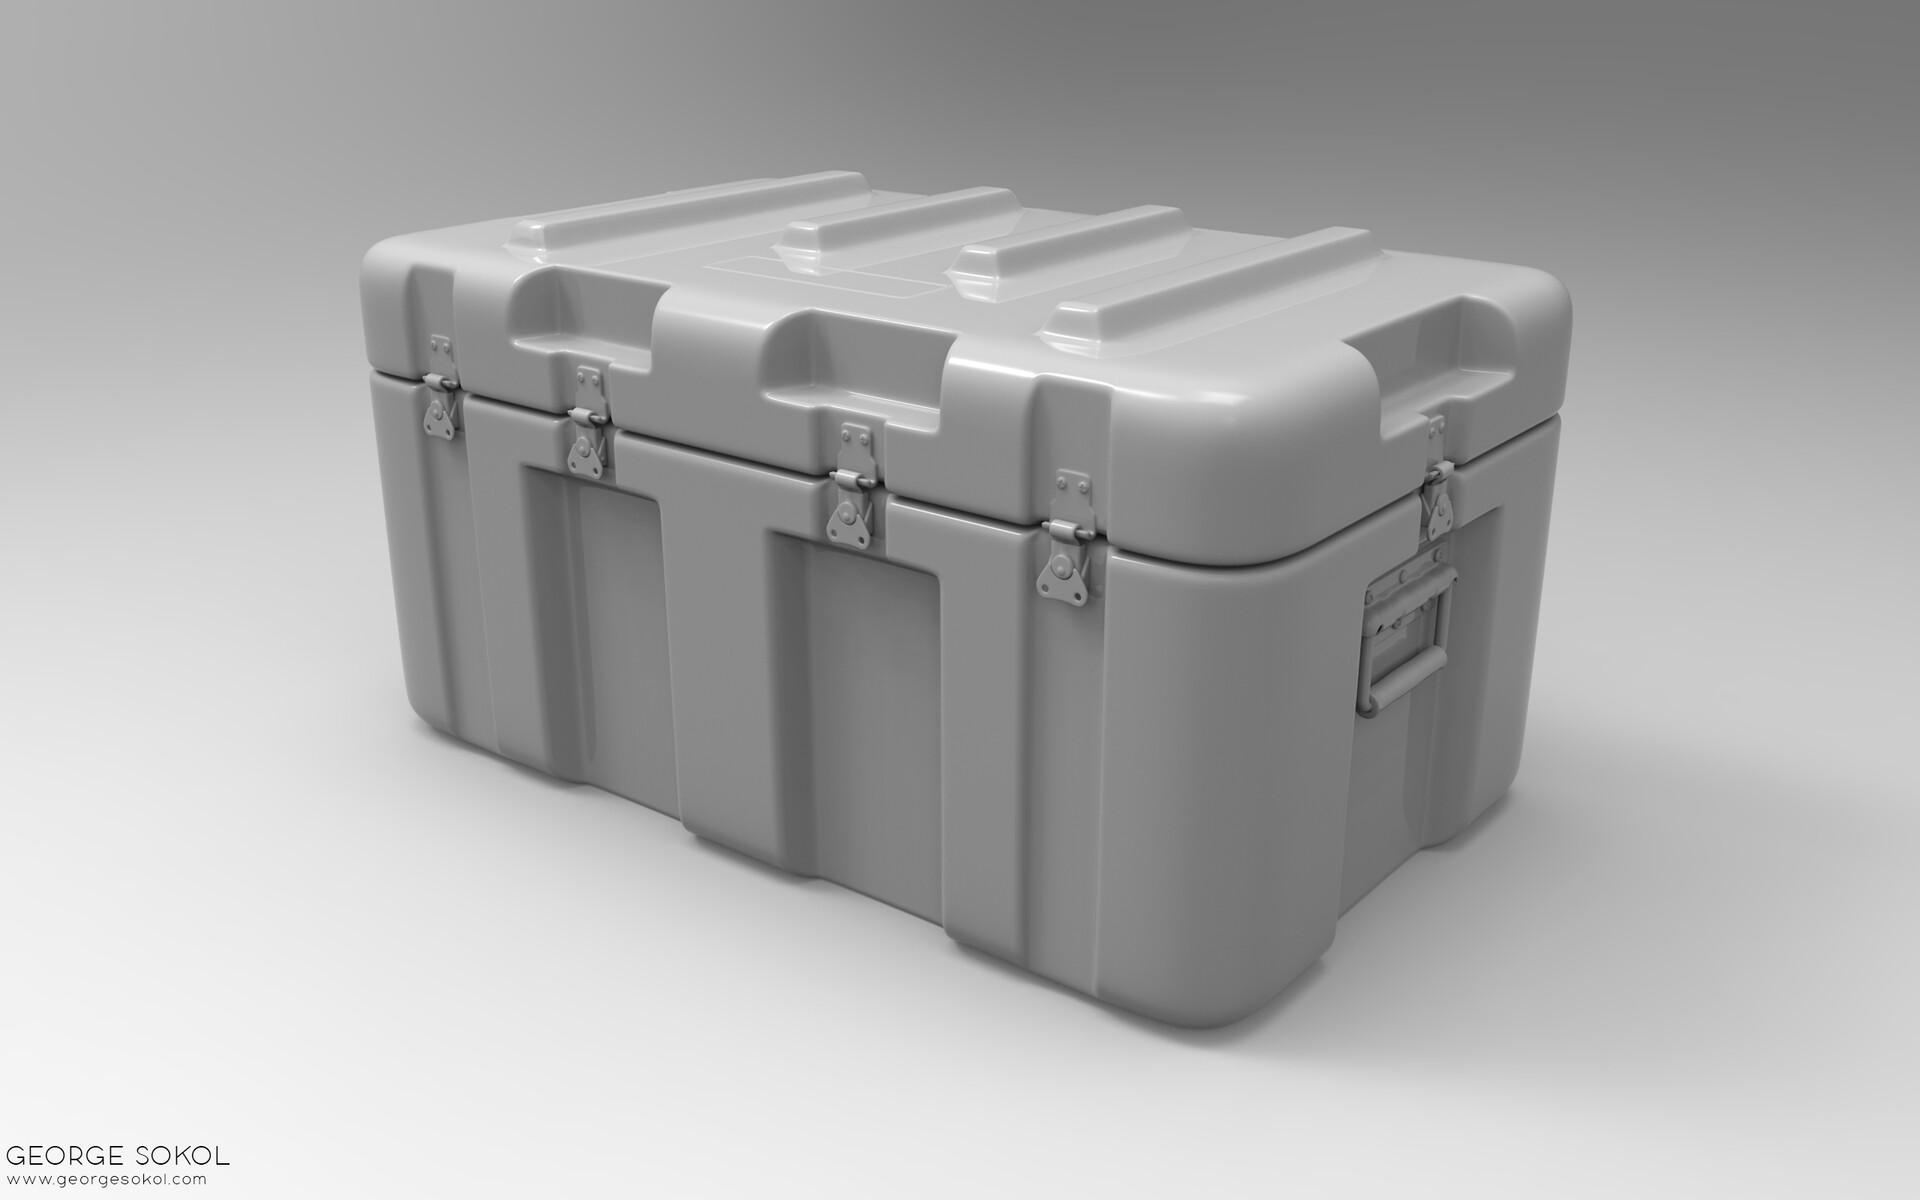 George sokol gs crate hp 1